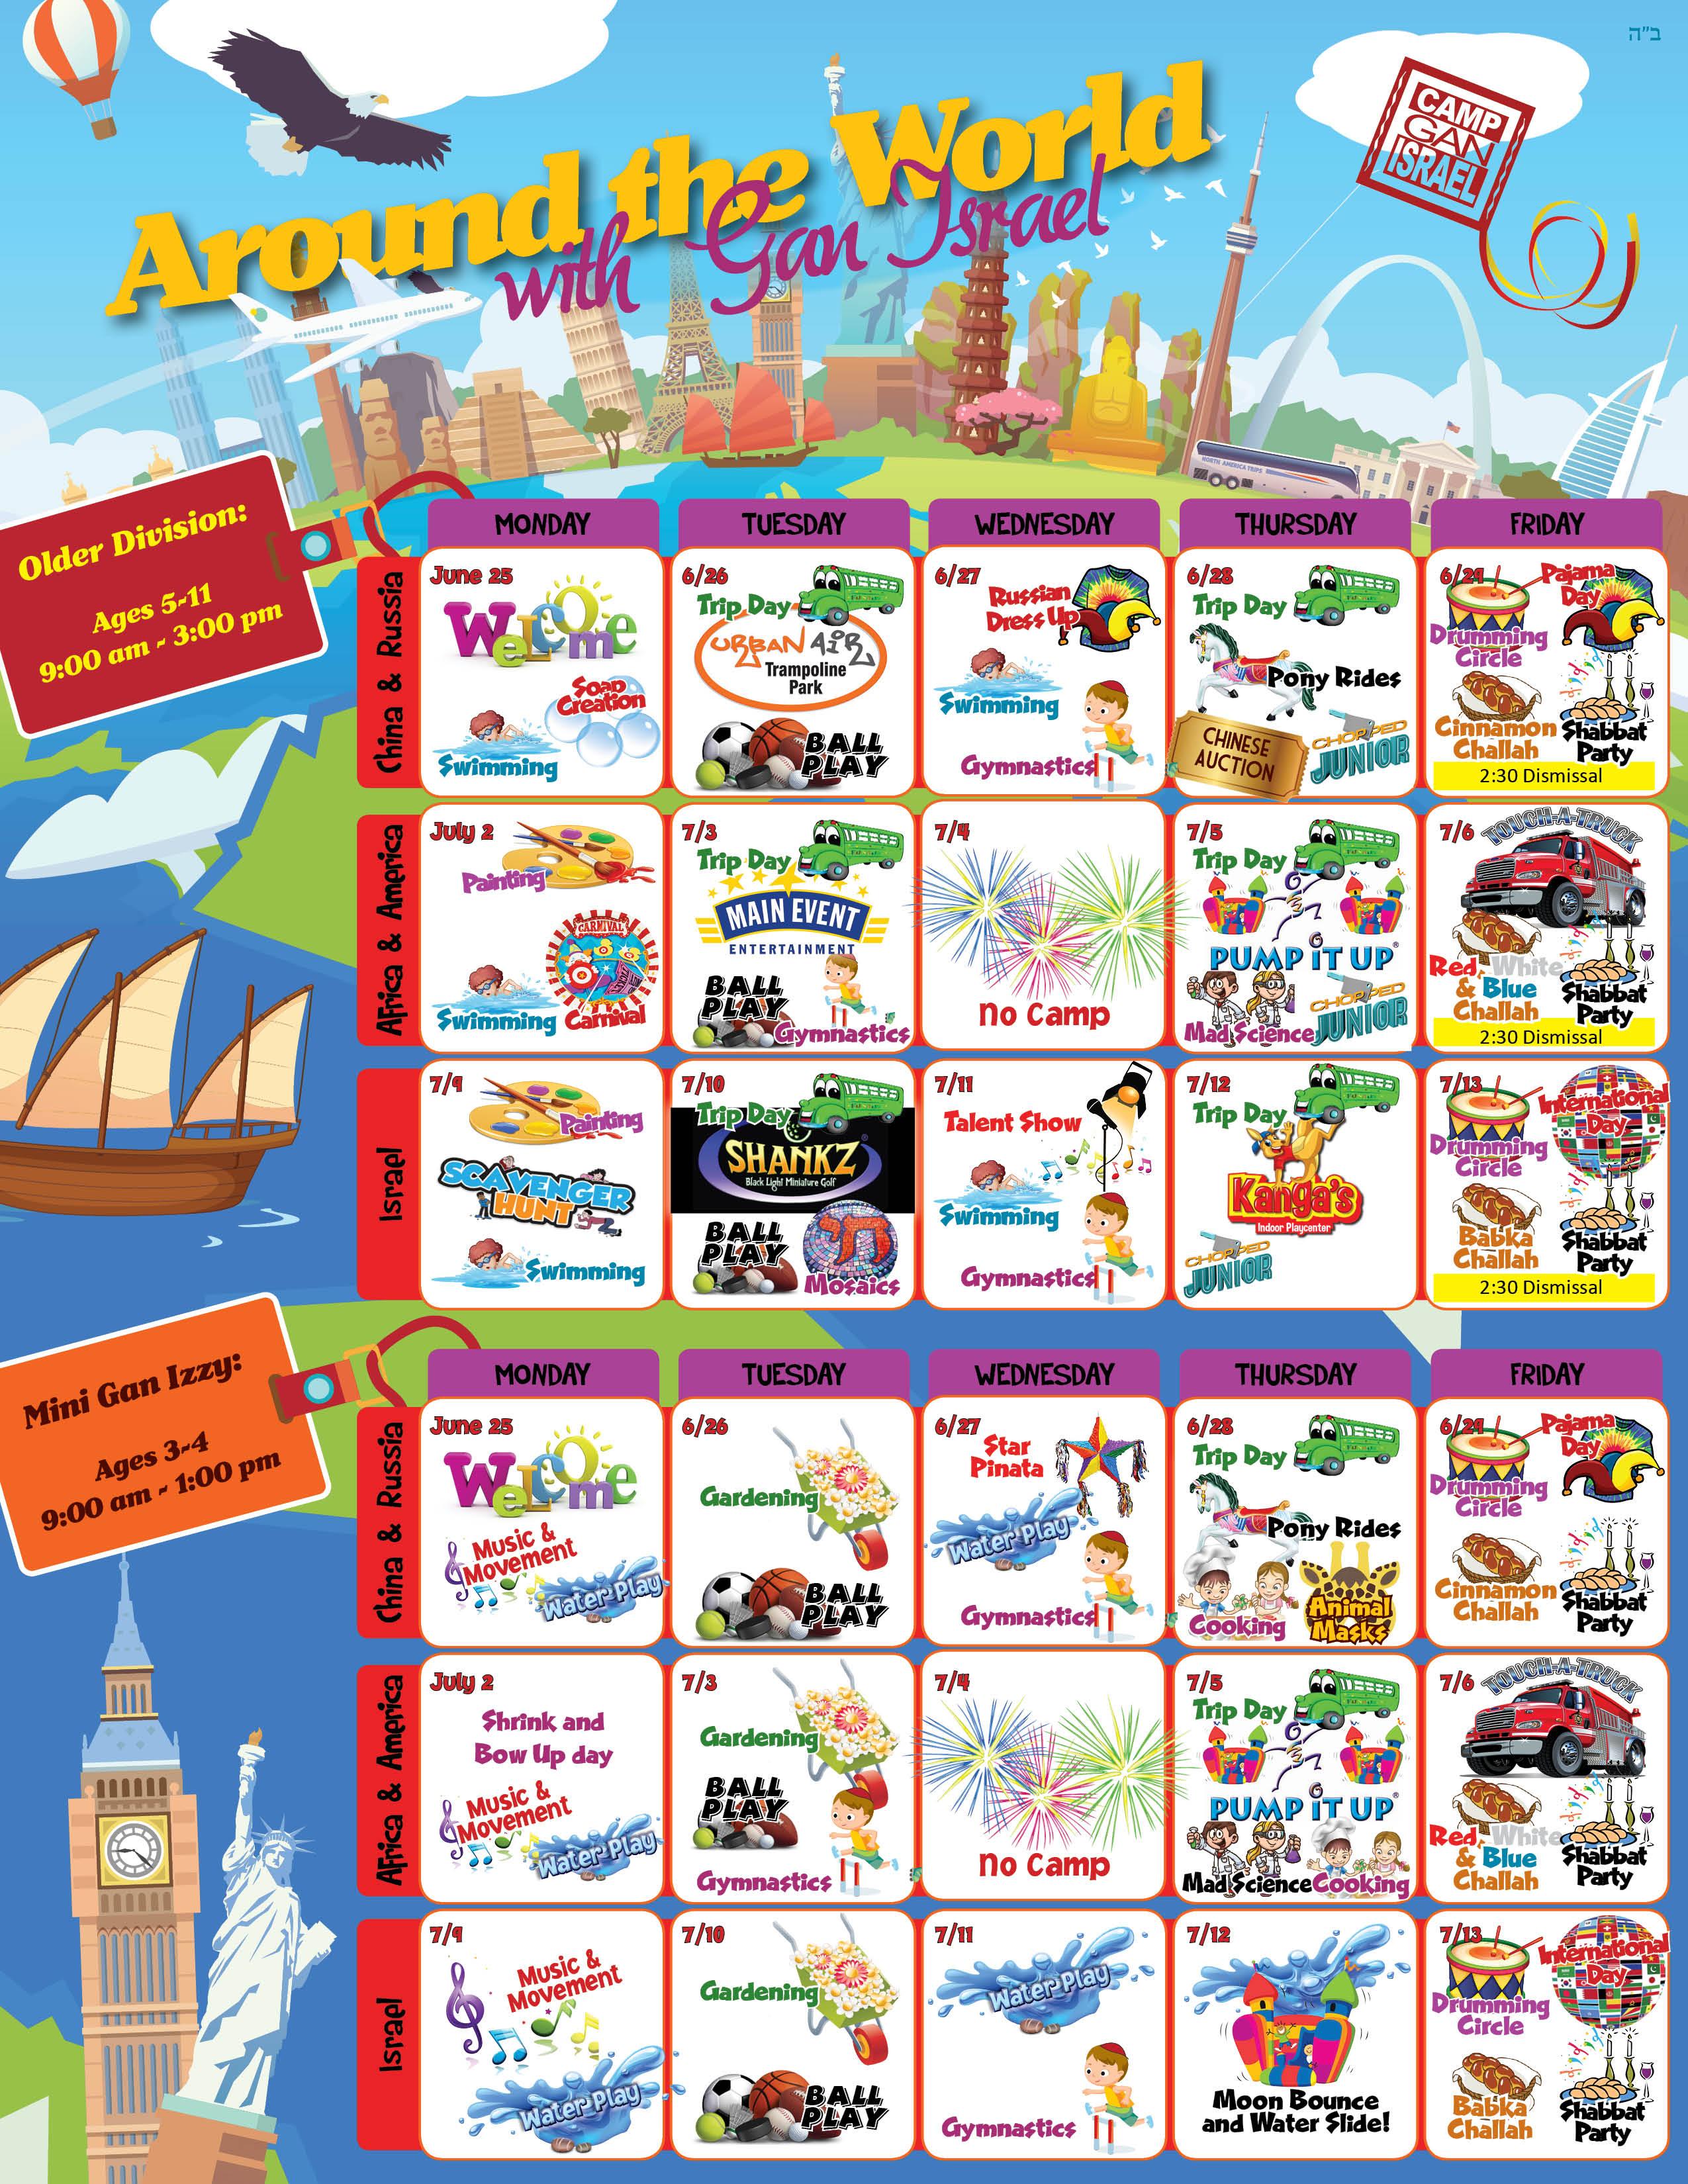 CalendarAroundWorld.jpg